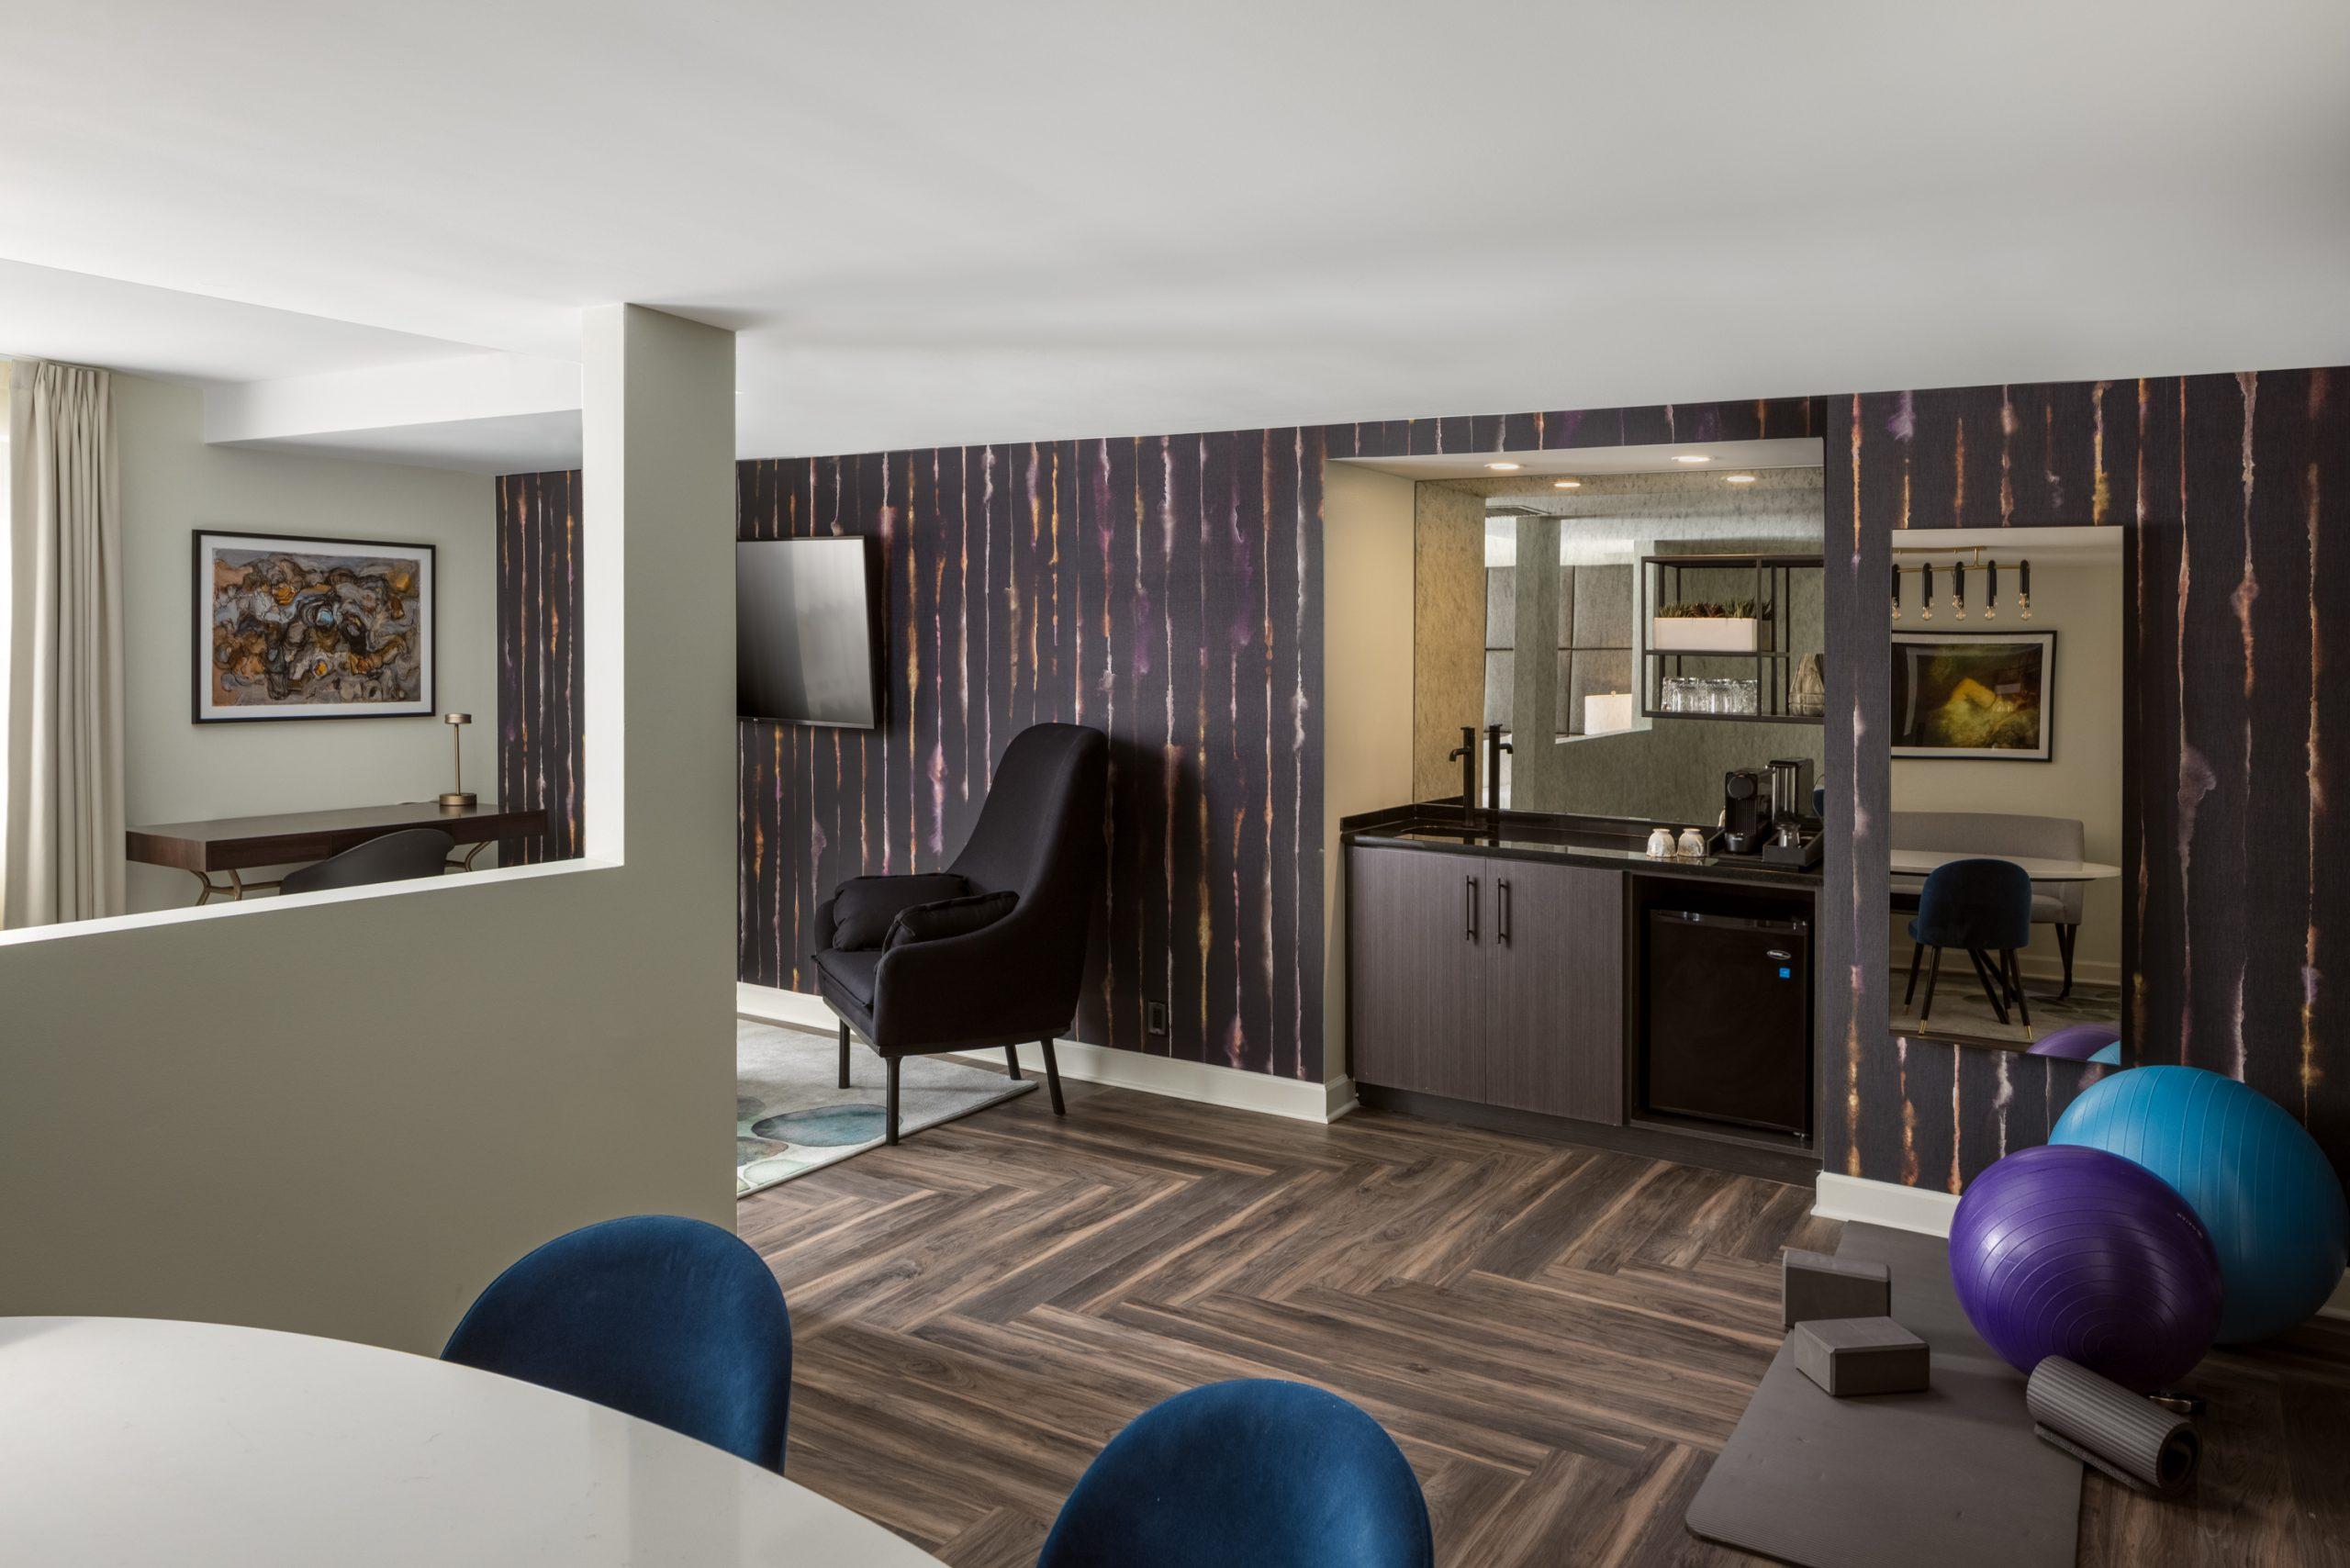 Hotel-Deco-executivekingsuite-3b